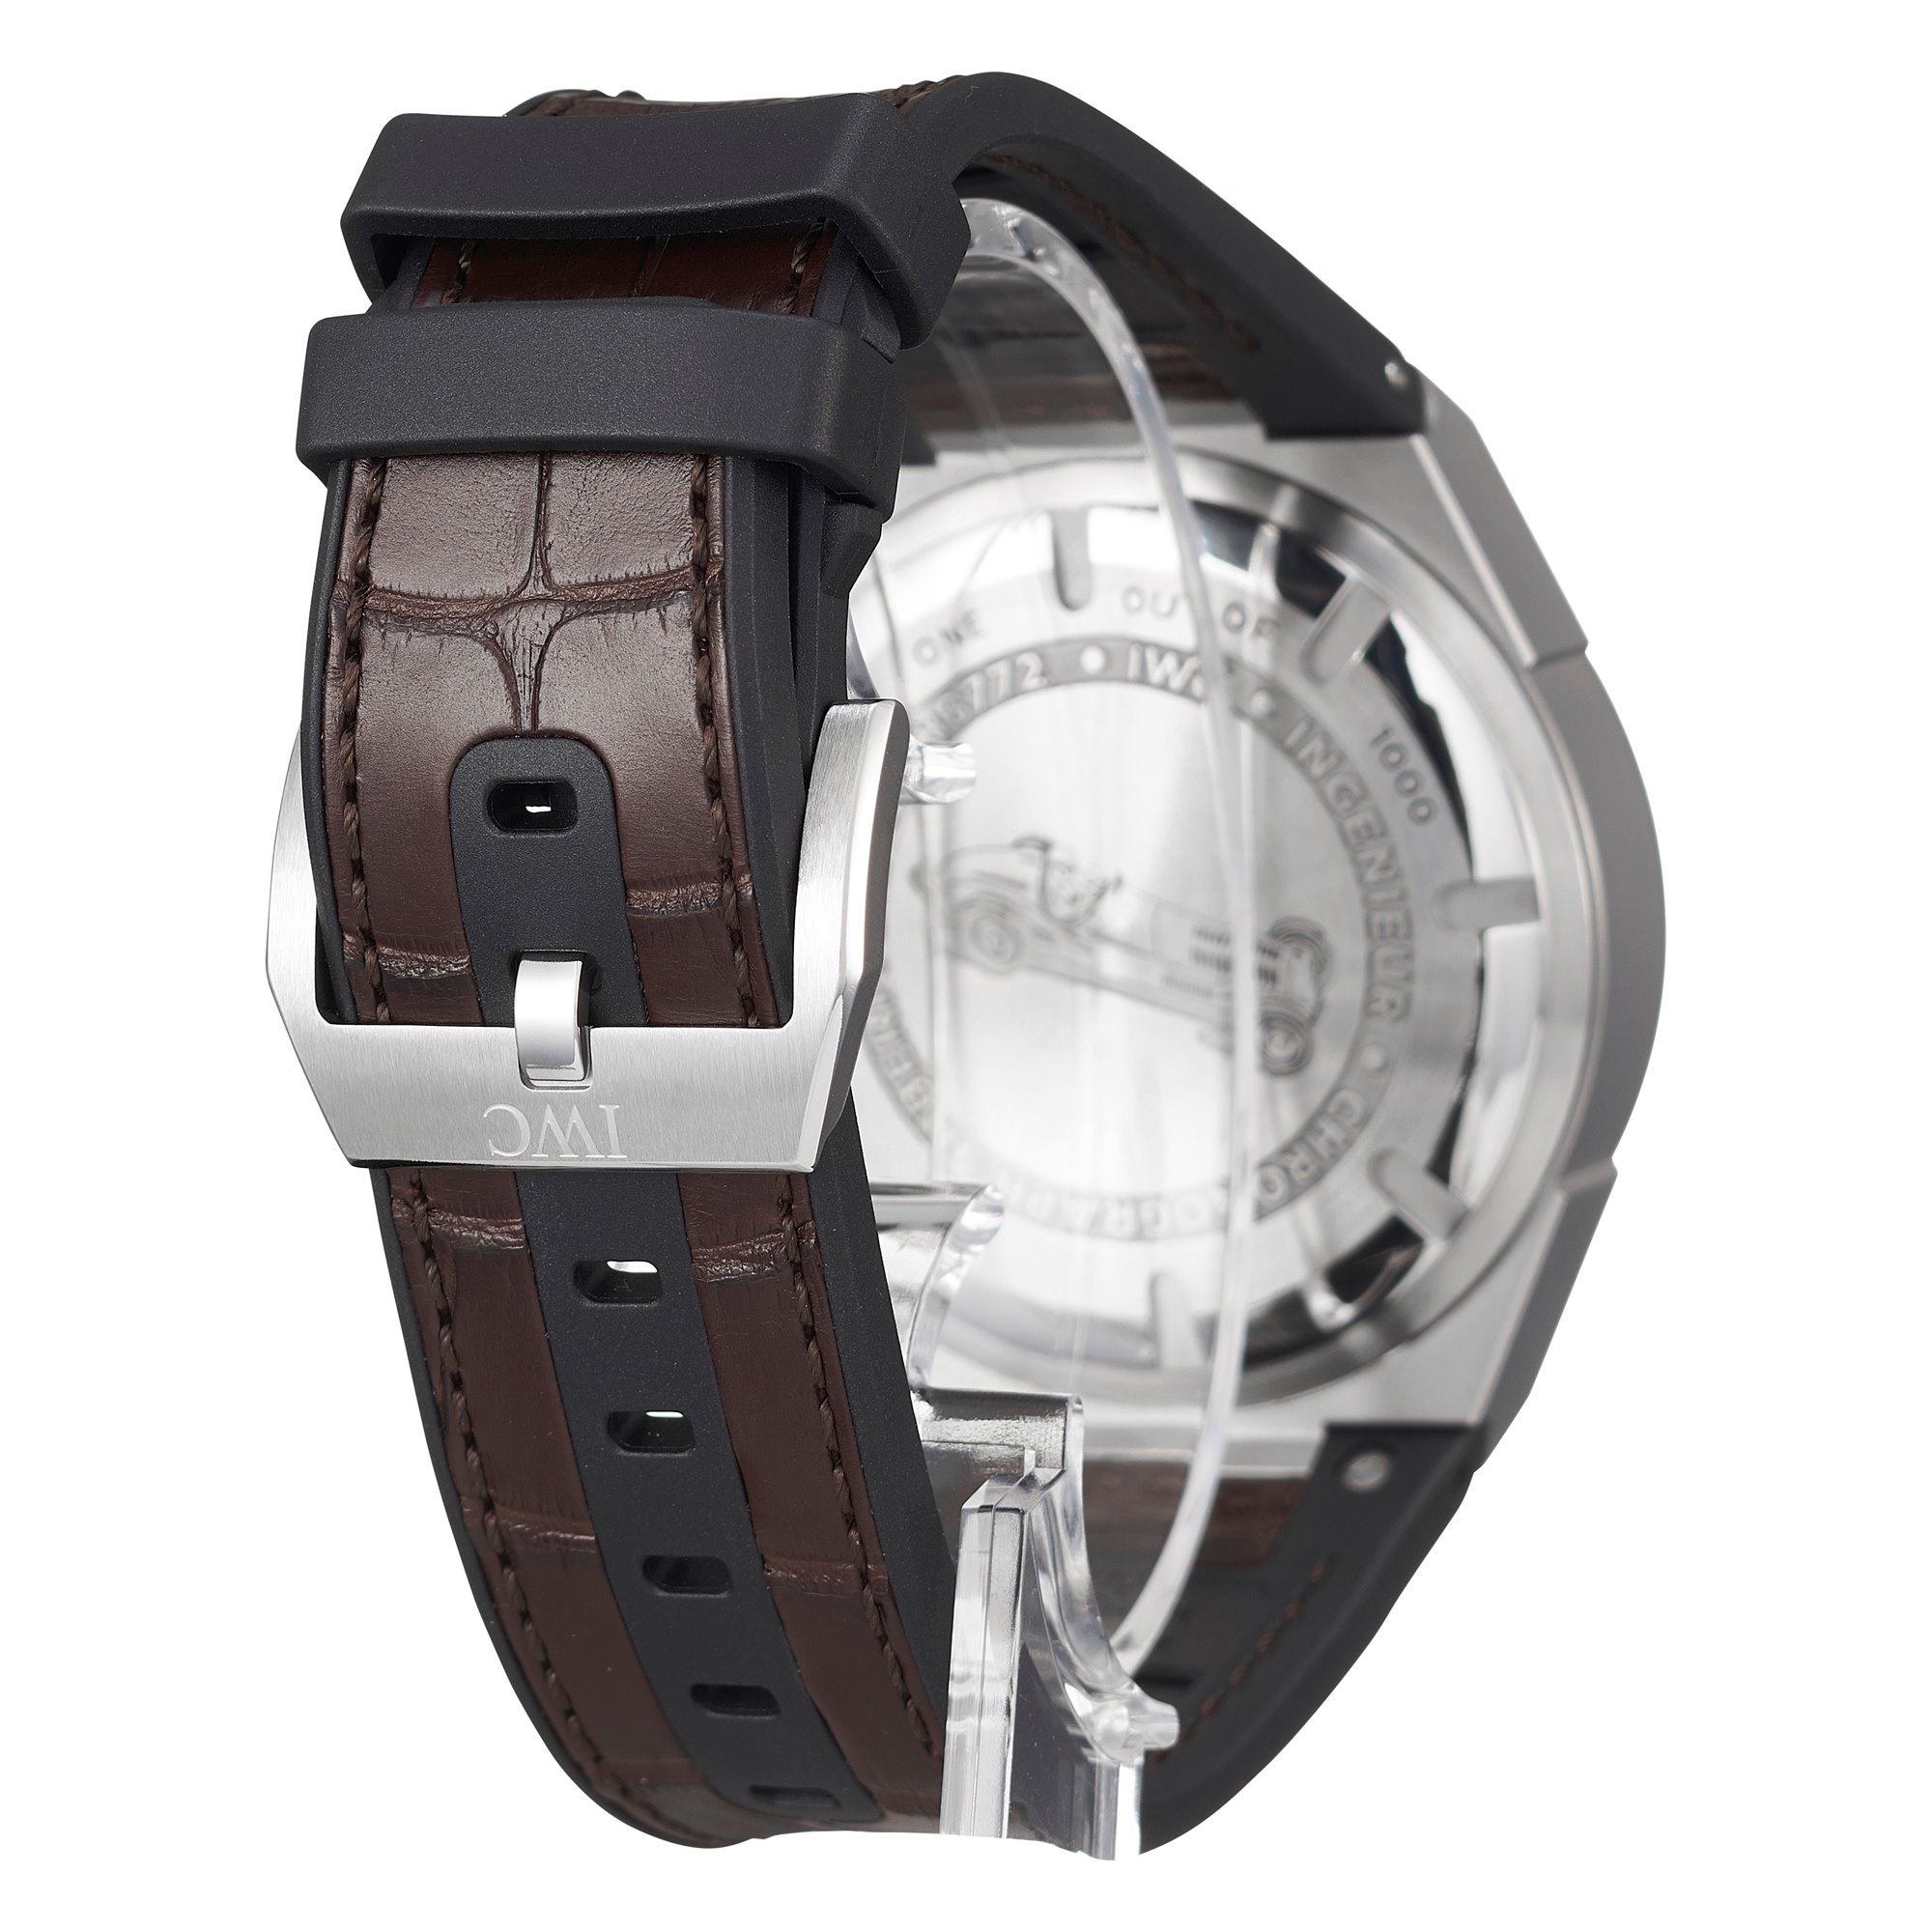 IWC Ingenieur Chronograph Silberpfeil Stainless Steel IW378511